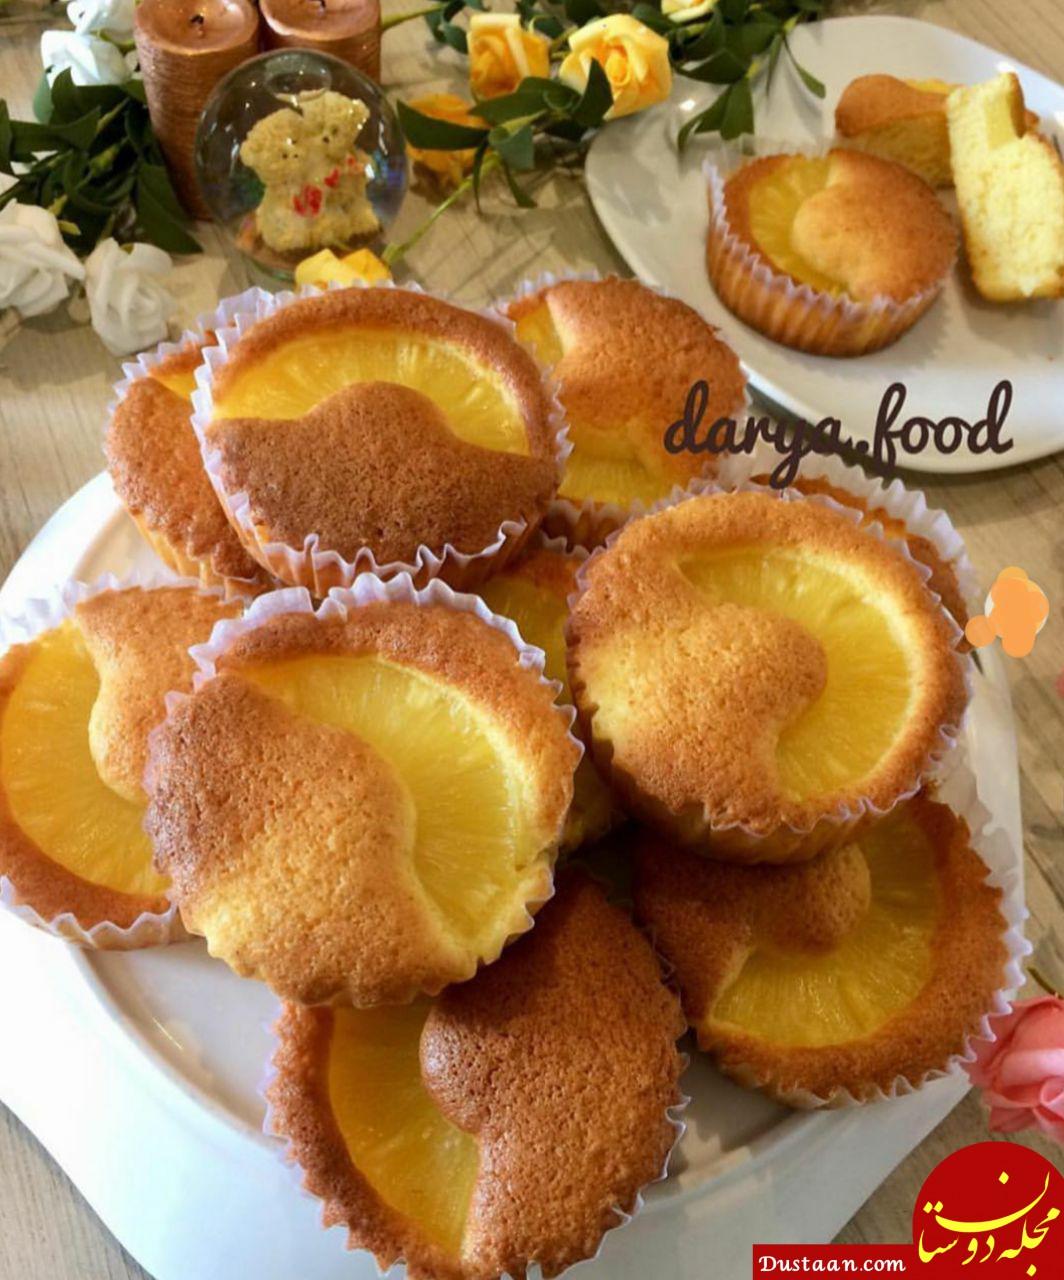 www.dustaan.com طرز تهیه پای آناناس به سبکی متفاوت و خوشمزه